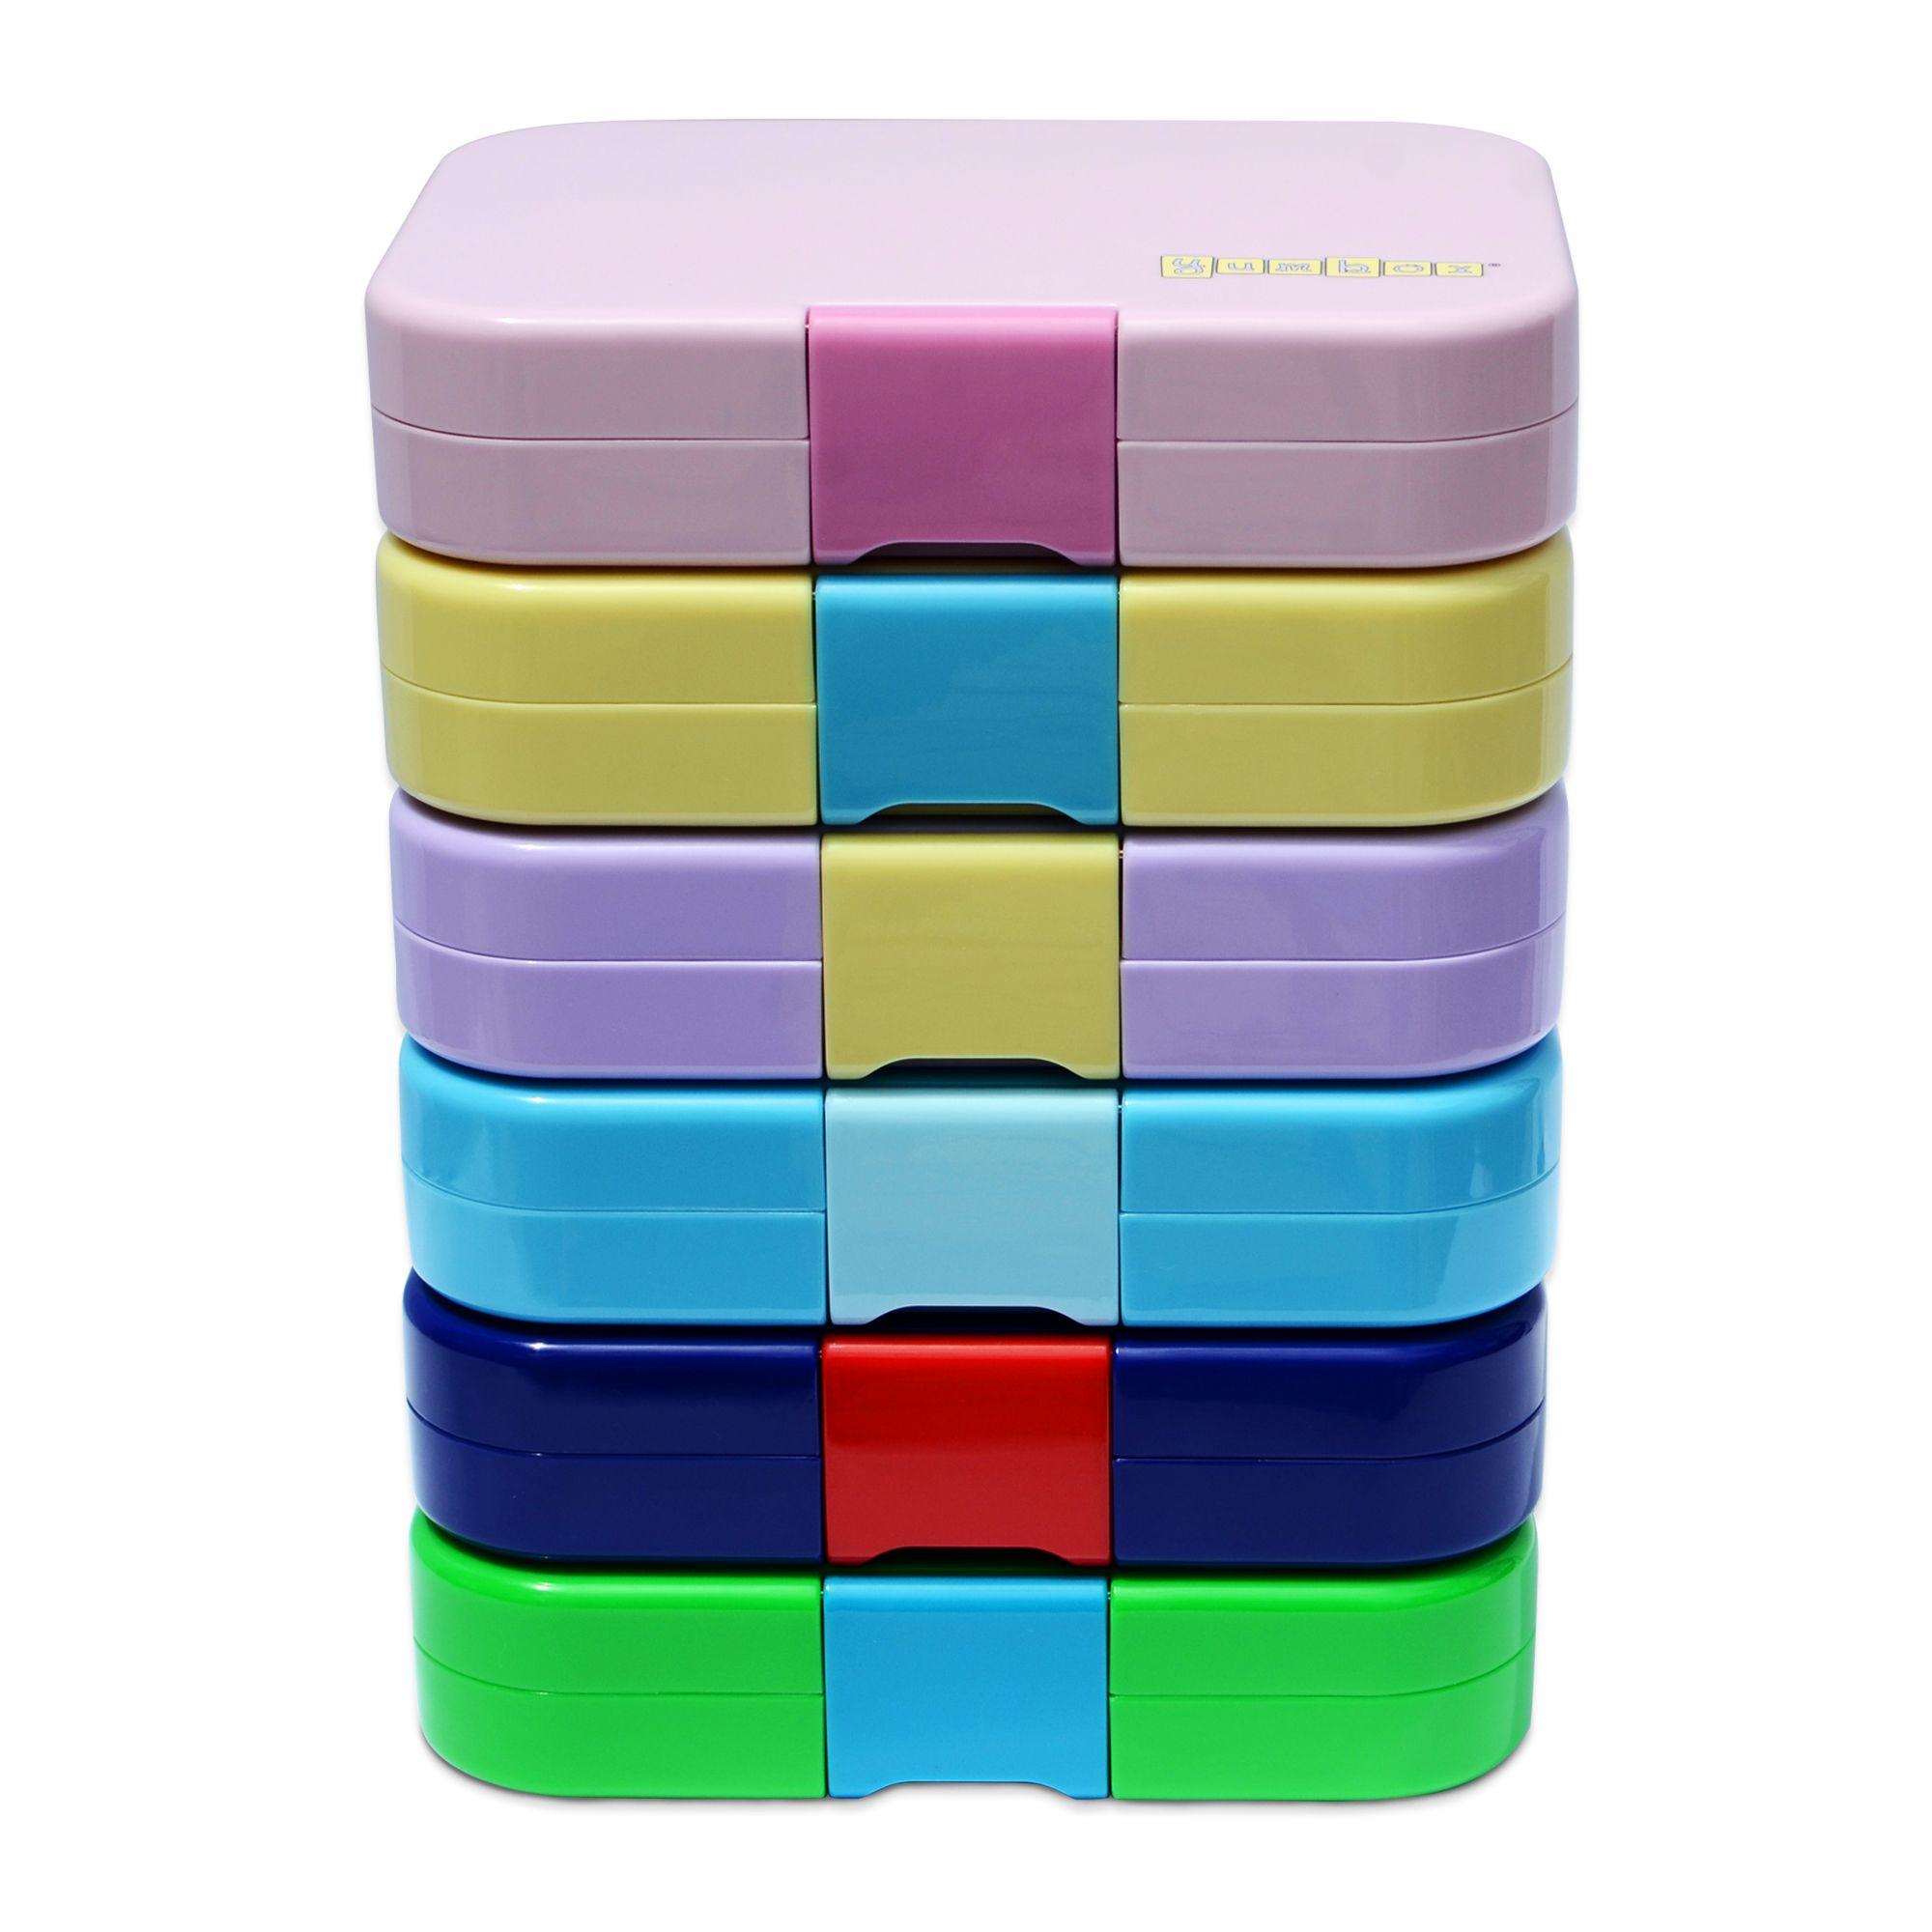 Yumbox Original - Boxes